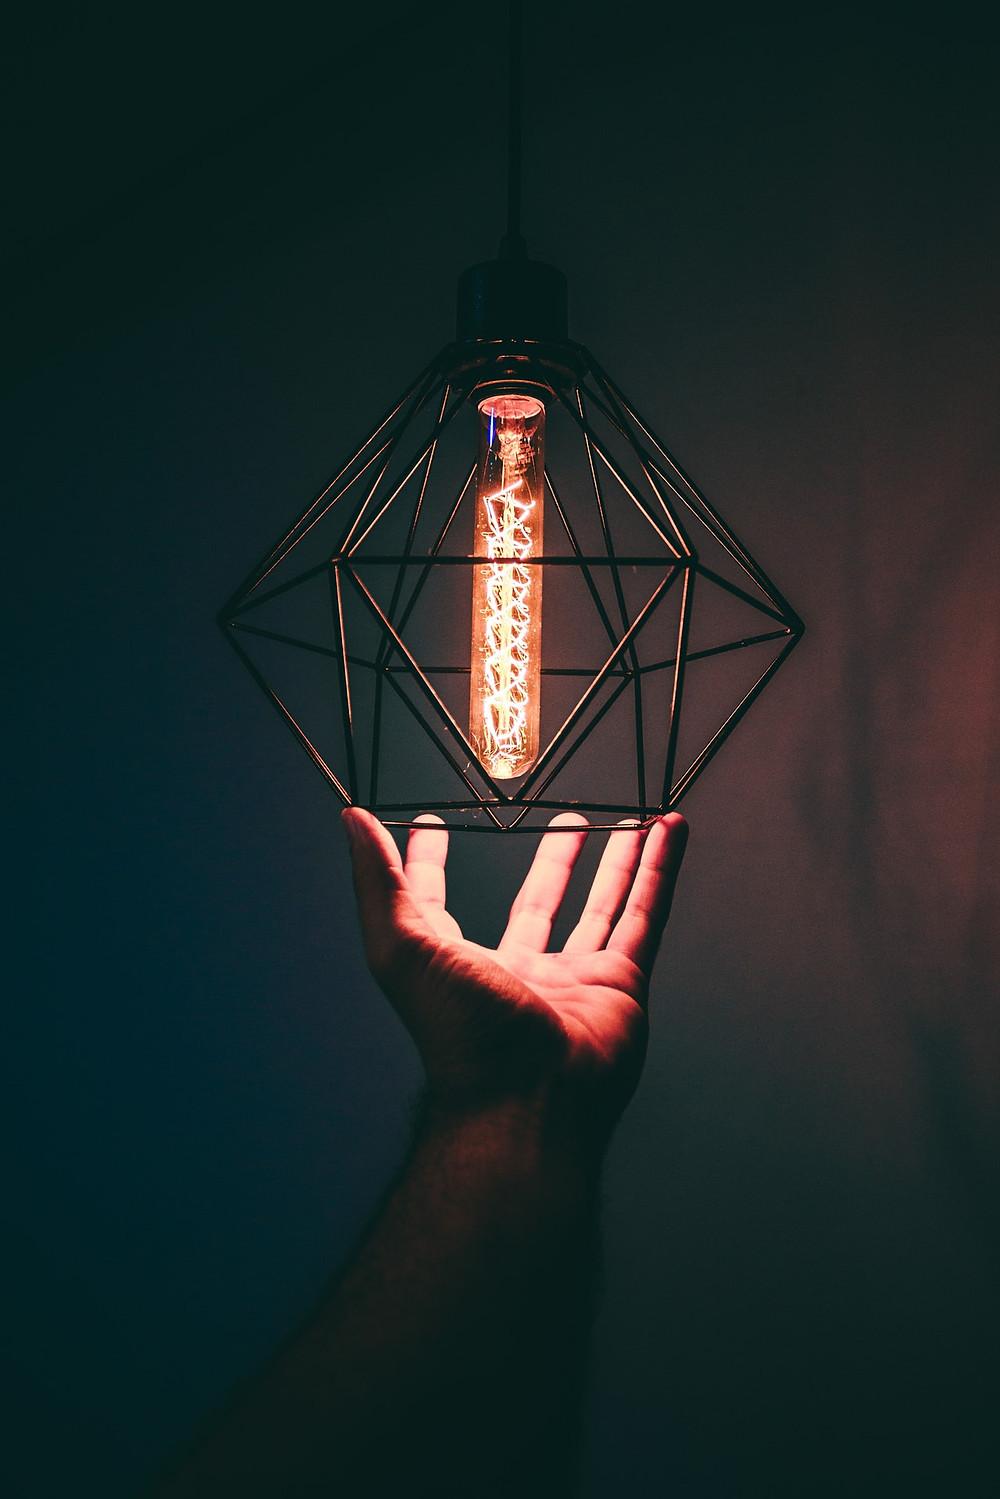 man holding led light fixture